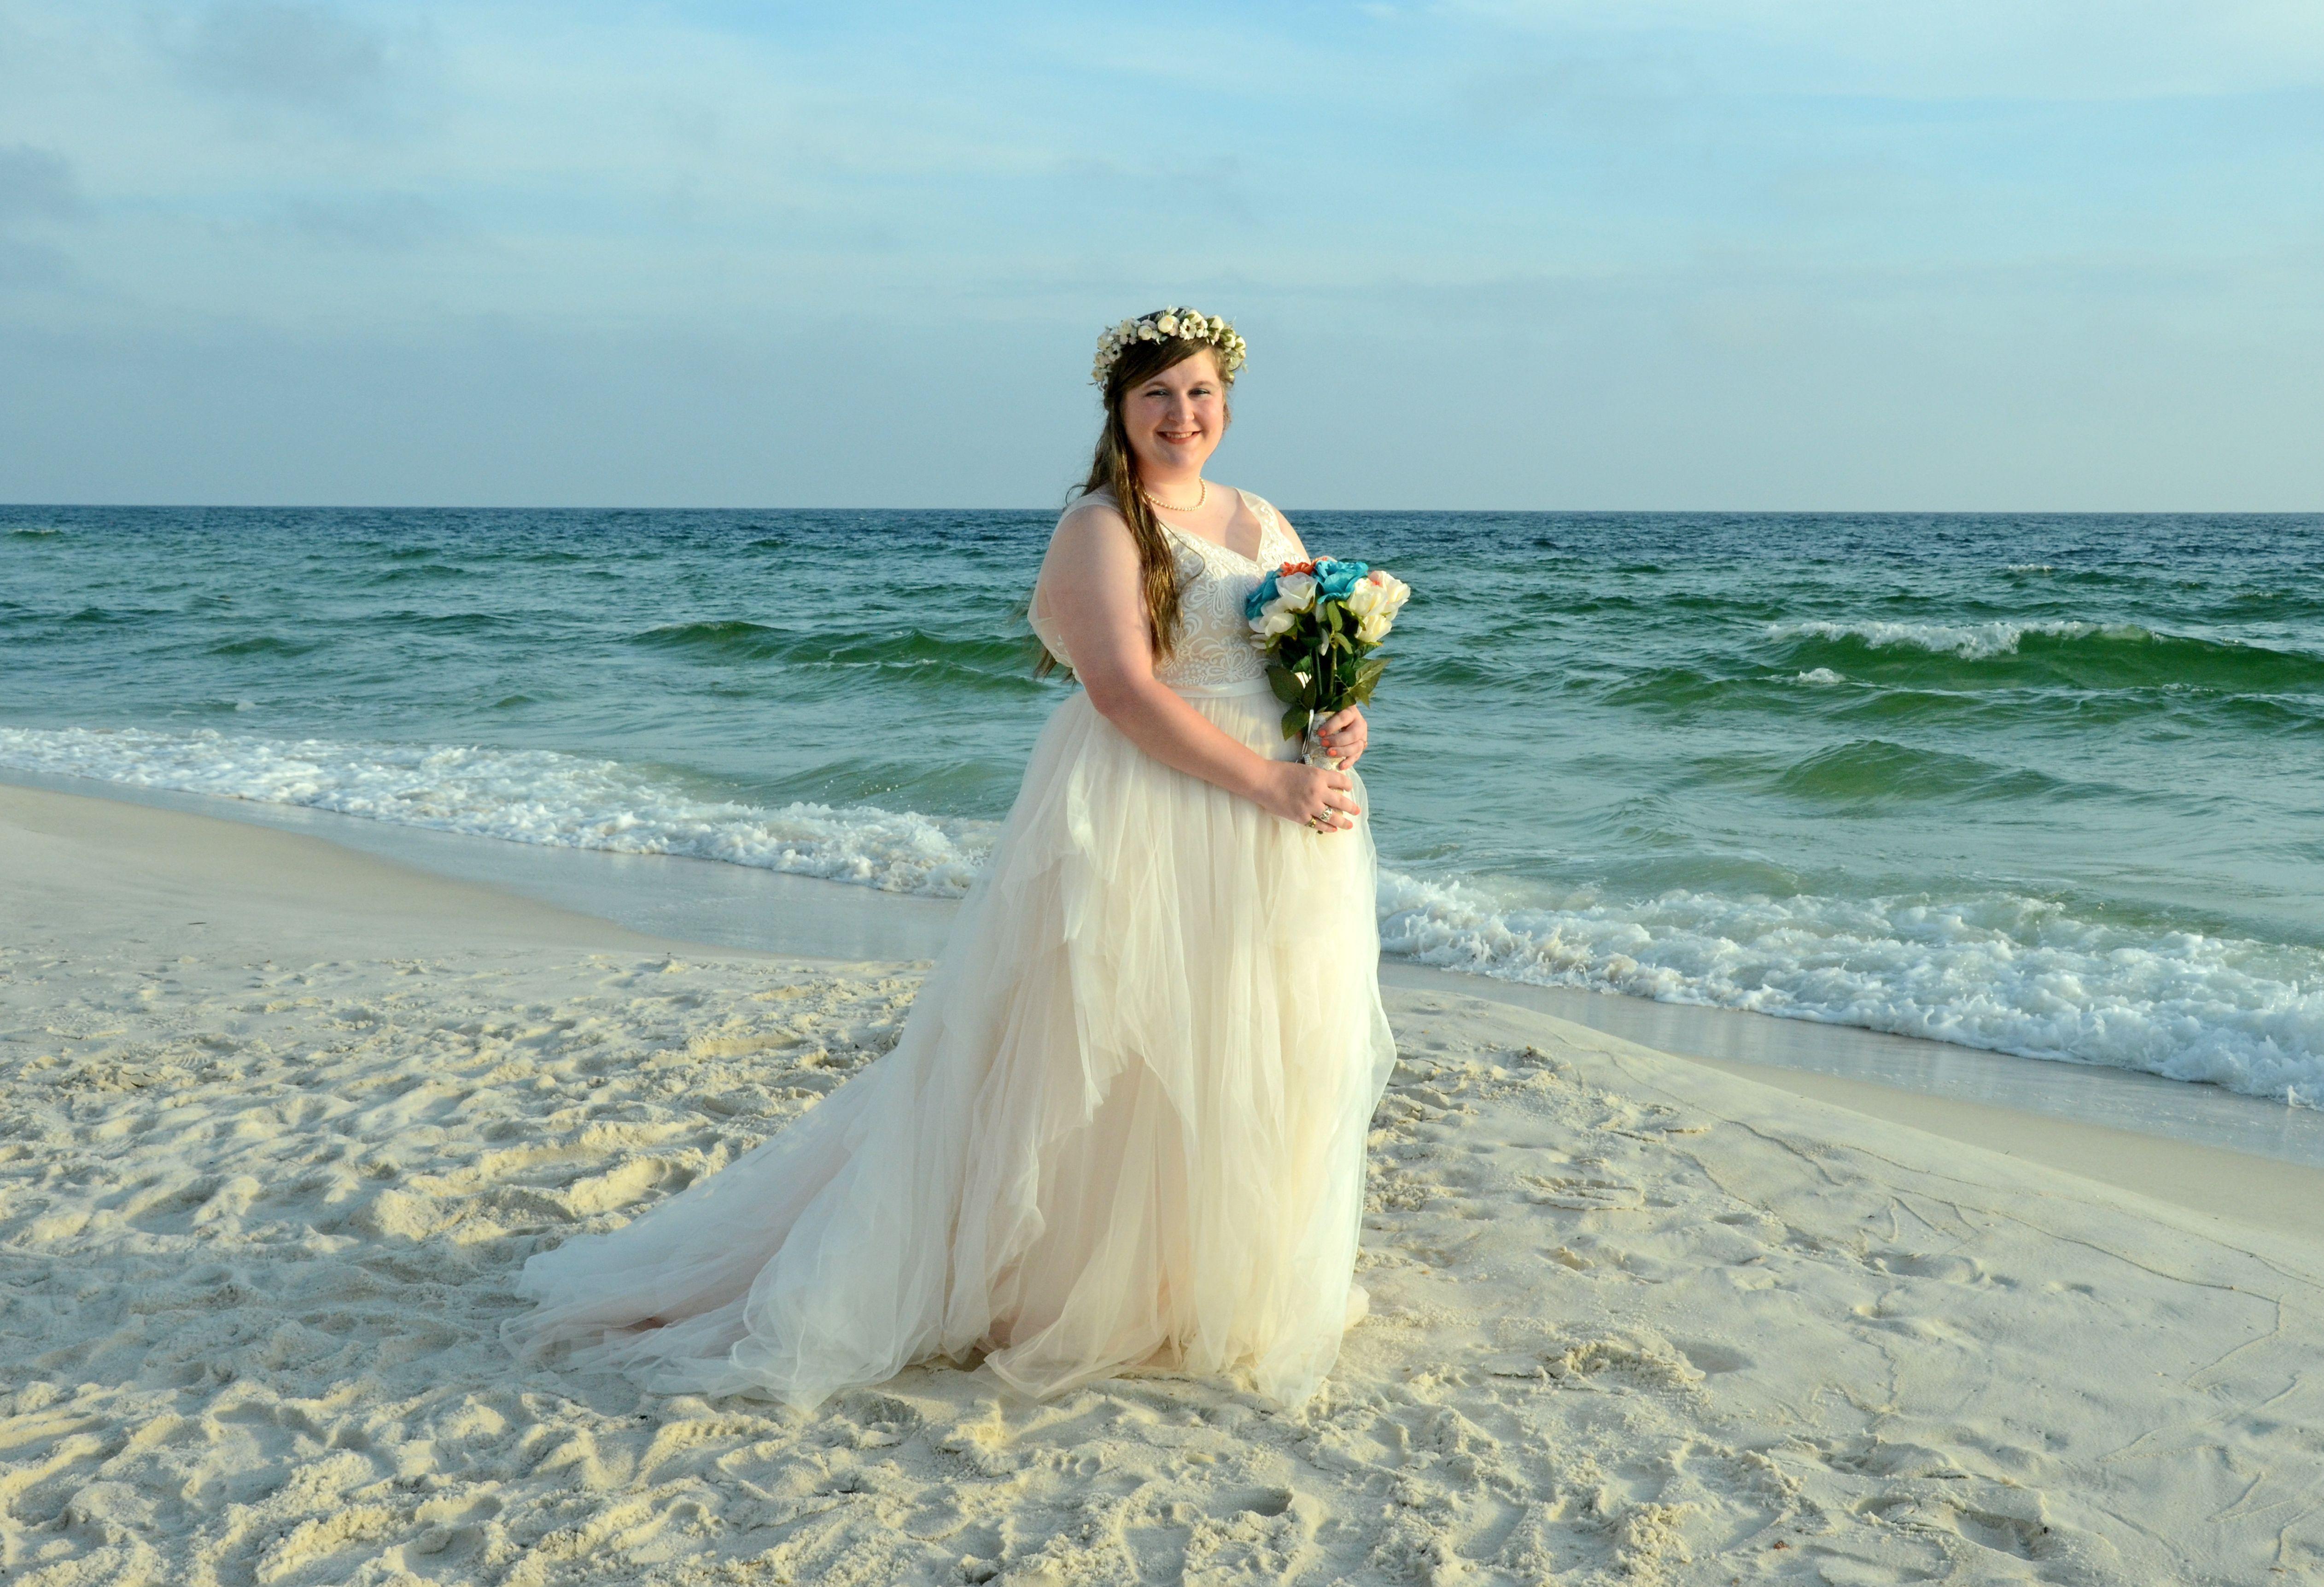 Florida Beach Wedding In 2020 Sunset Beach Weddings Beach Bride Florida Beach Wedding